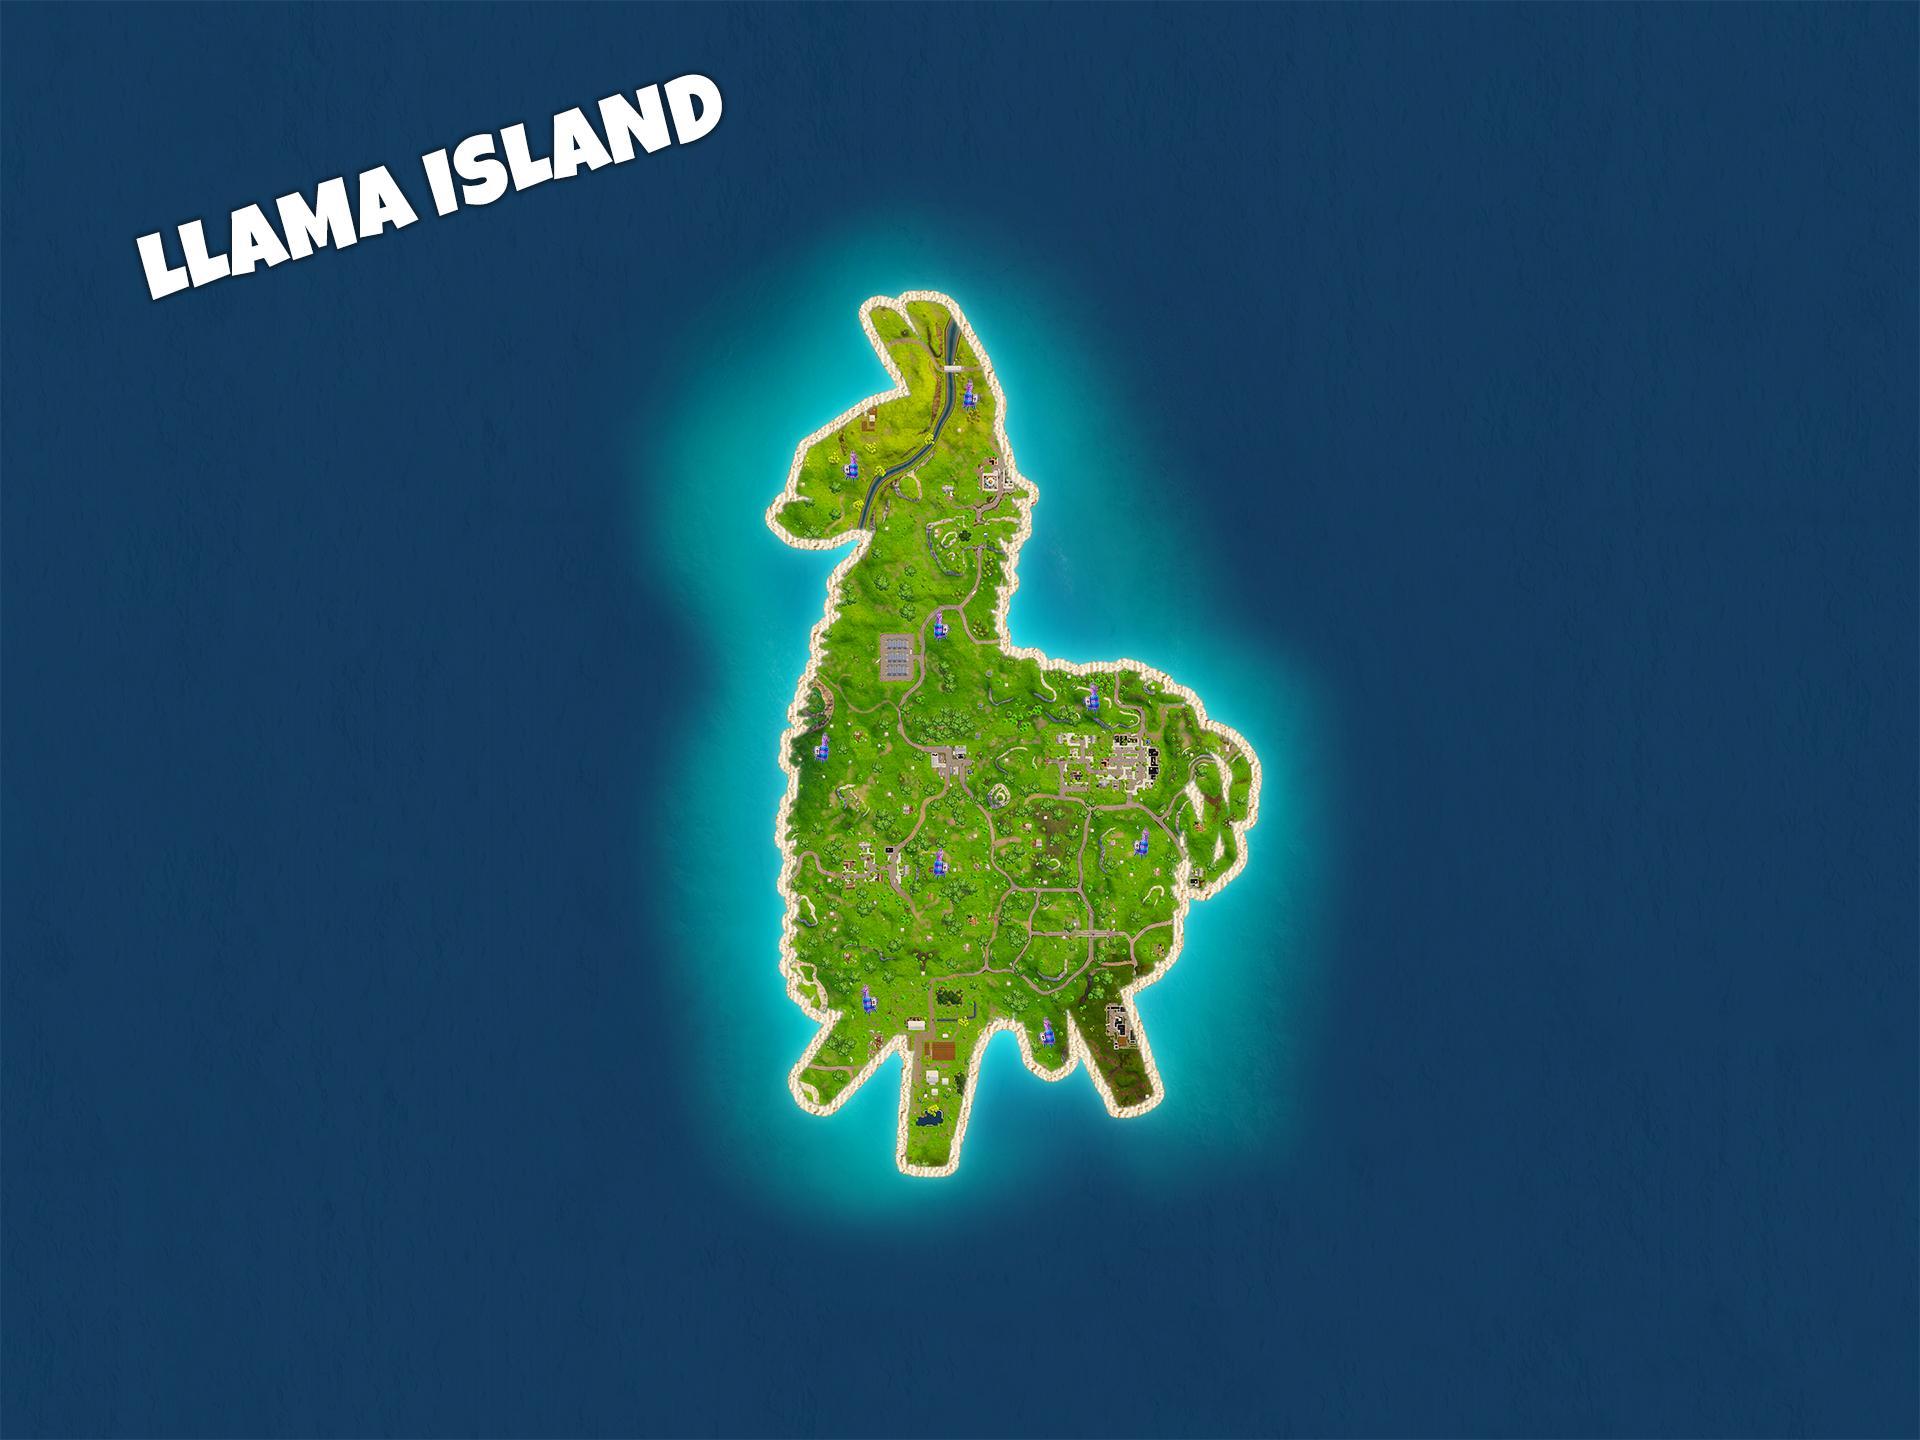 Llama Fortnite Wallpaper Posted By Samantha Anderson